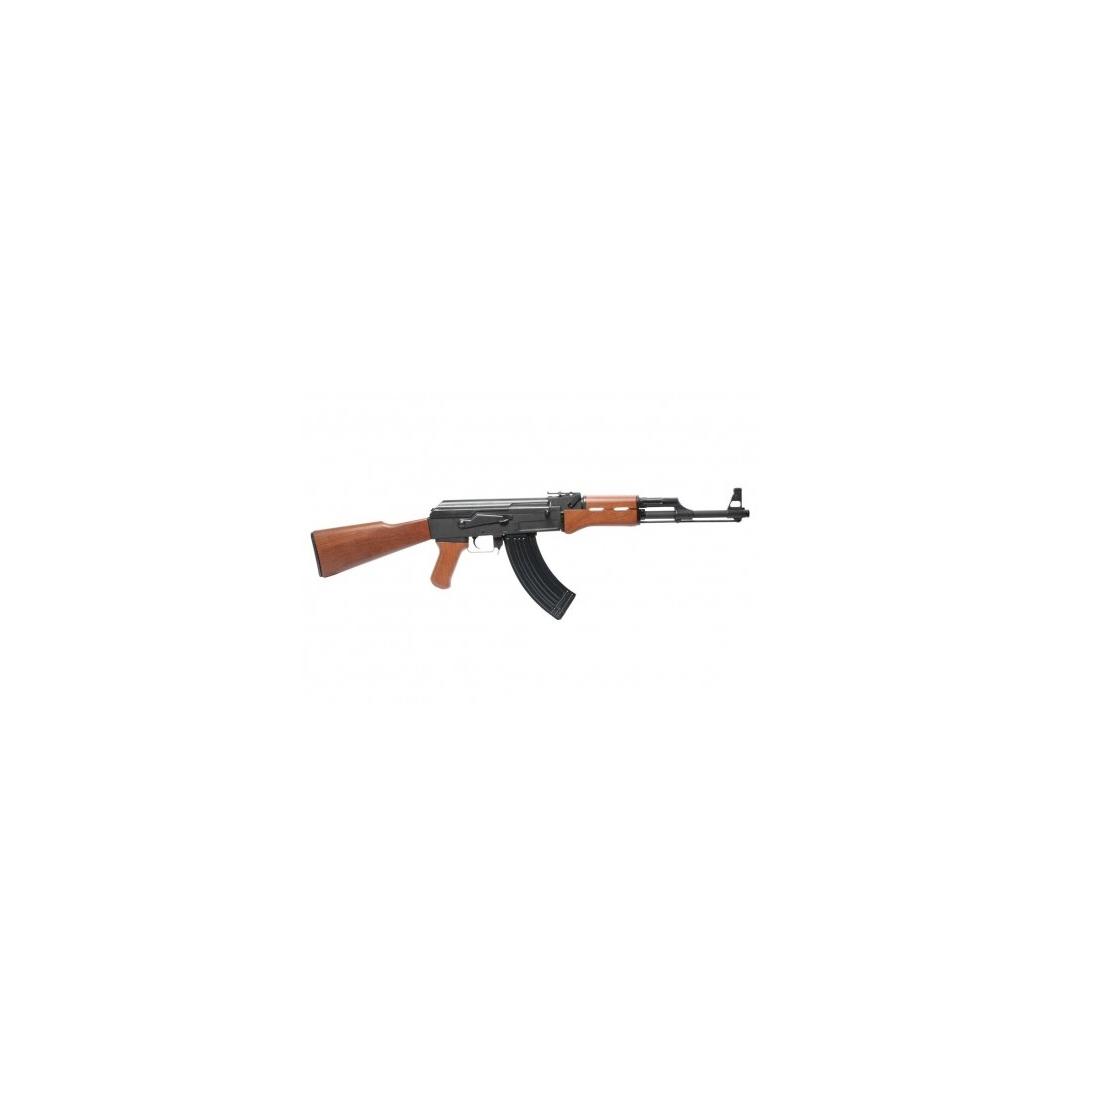 AEG CM RK47 Wood Combo [G&G]